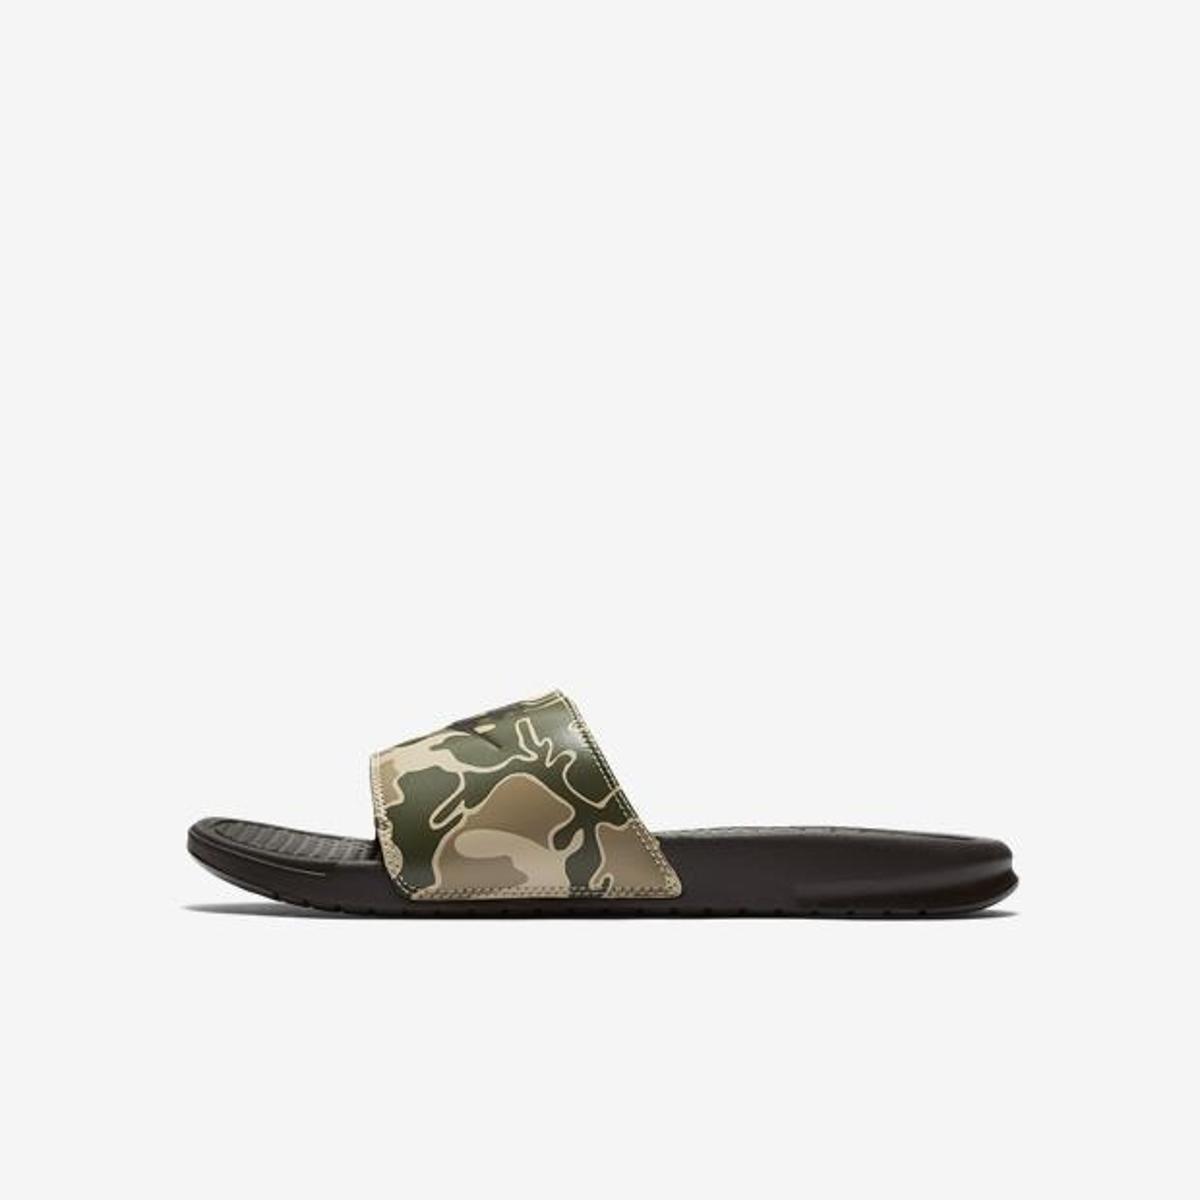 Chinelo Nike Benassi Jdi Print - Marrom - Compre Agora  86df1151beb15